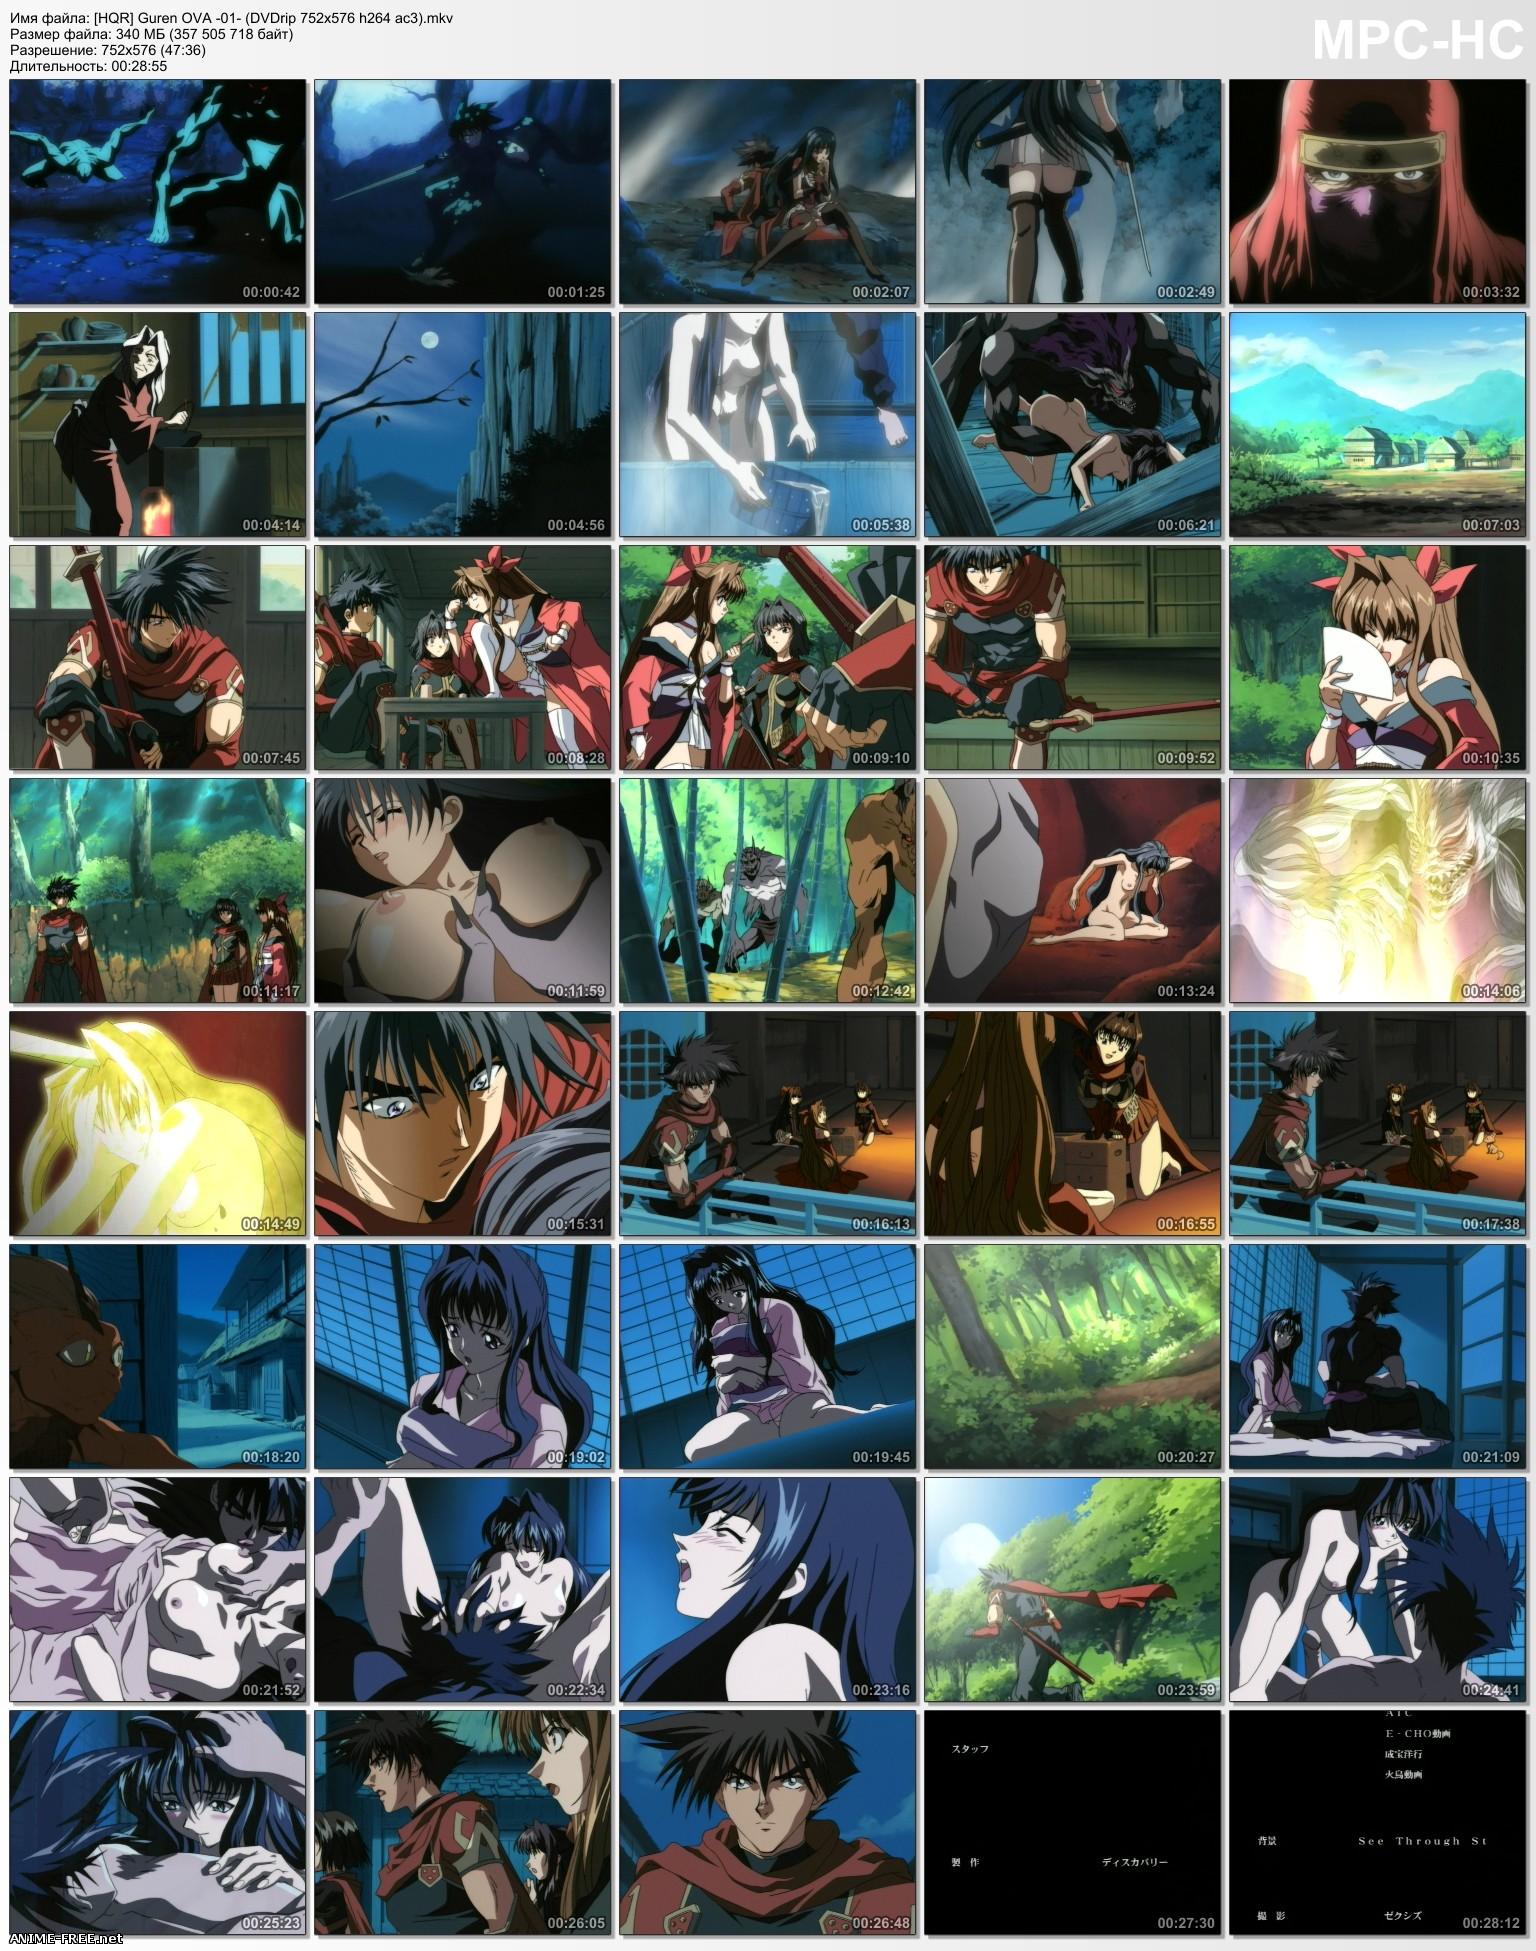 Blood Shadow / Guren / Кровавая тень [Ep.1-3] [RUS,ENG,JAP] Anime Hentai